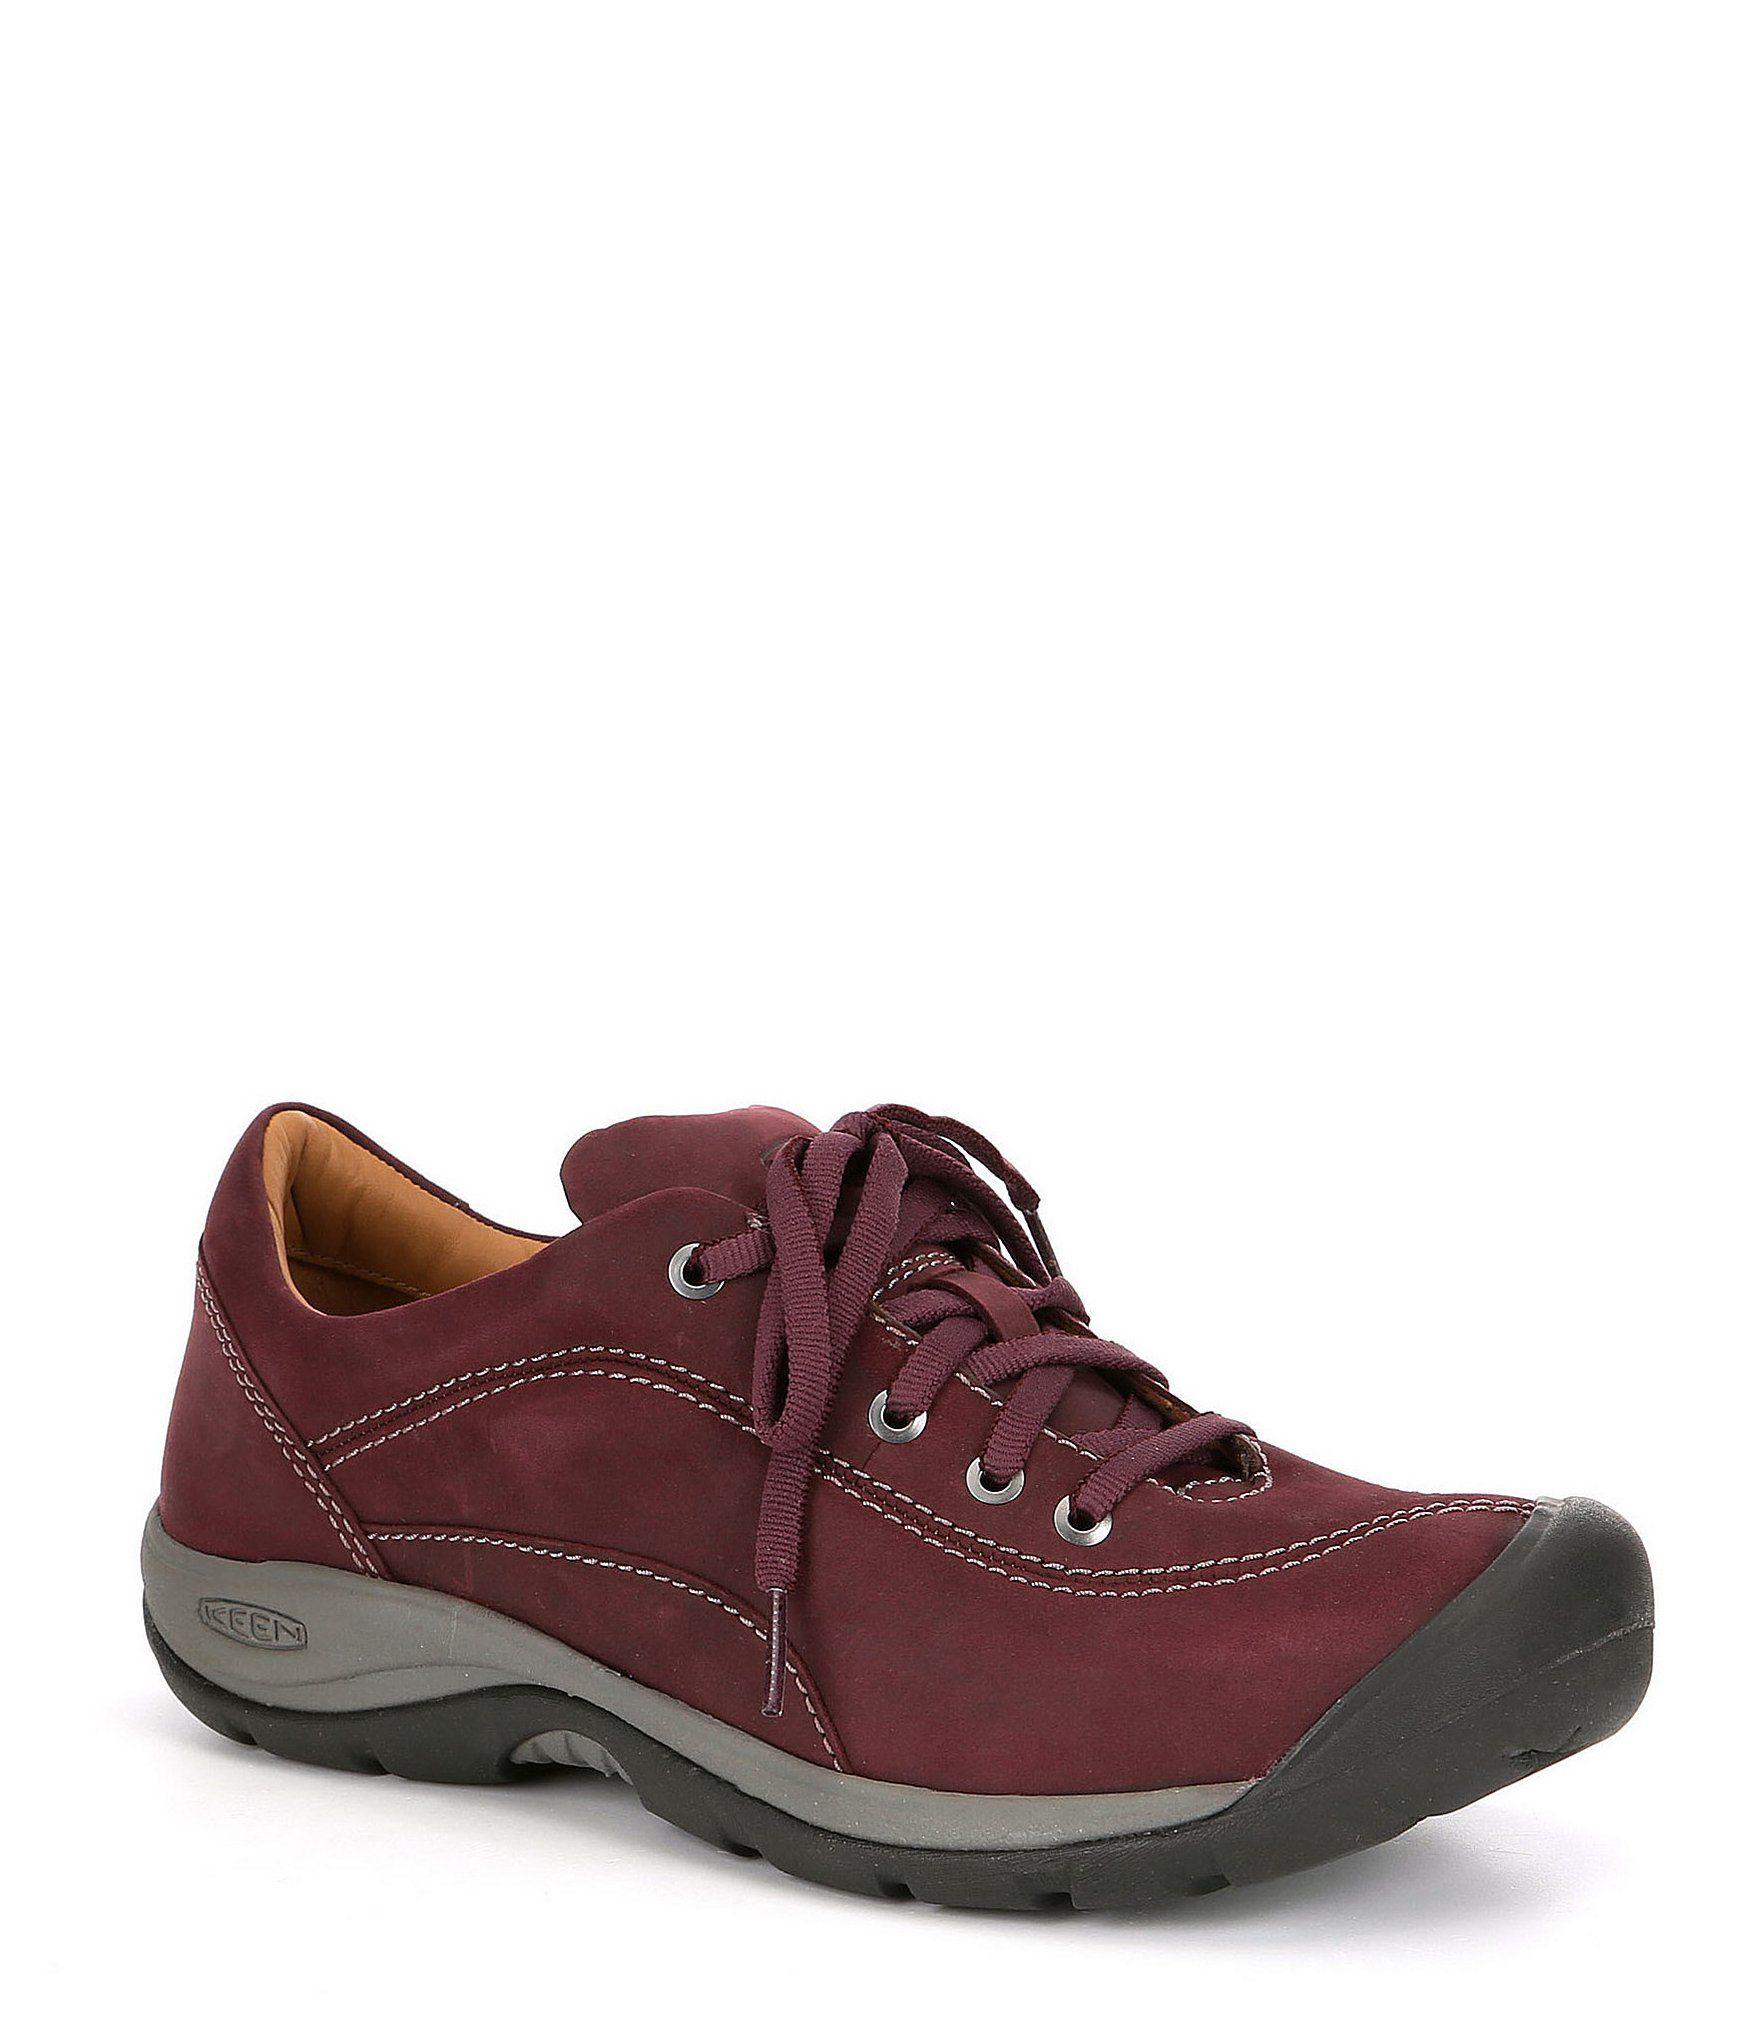 Keen Presidio II Oxford Sneakers Black/Steel Grey 7M